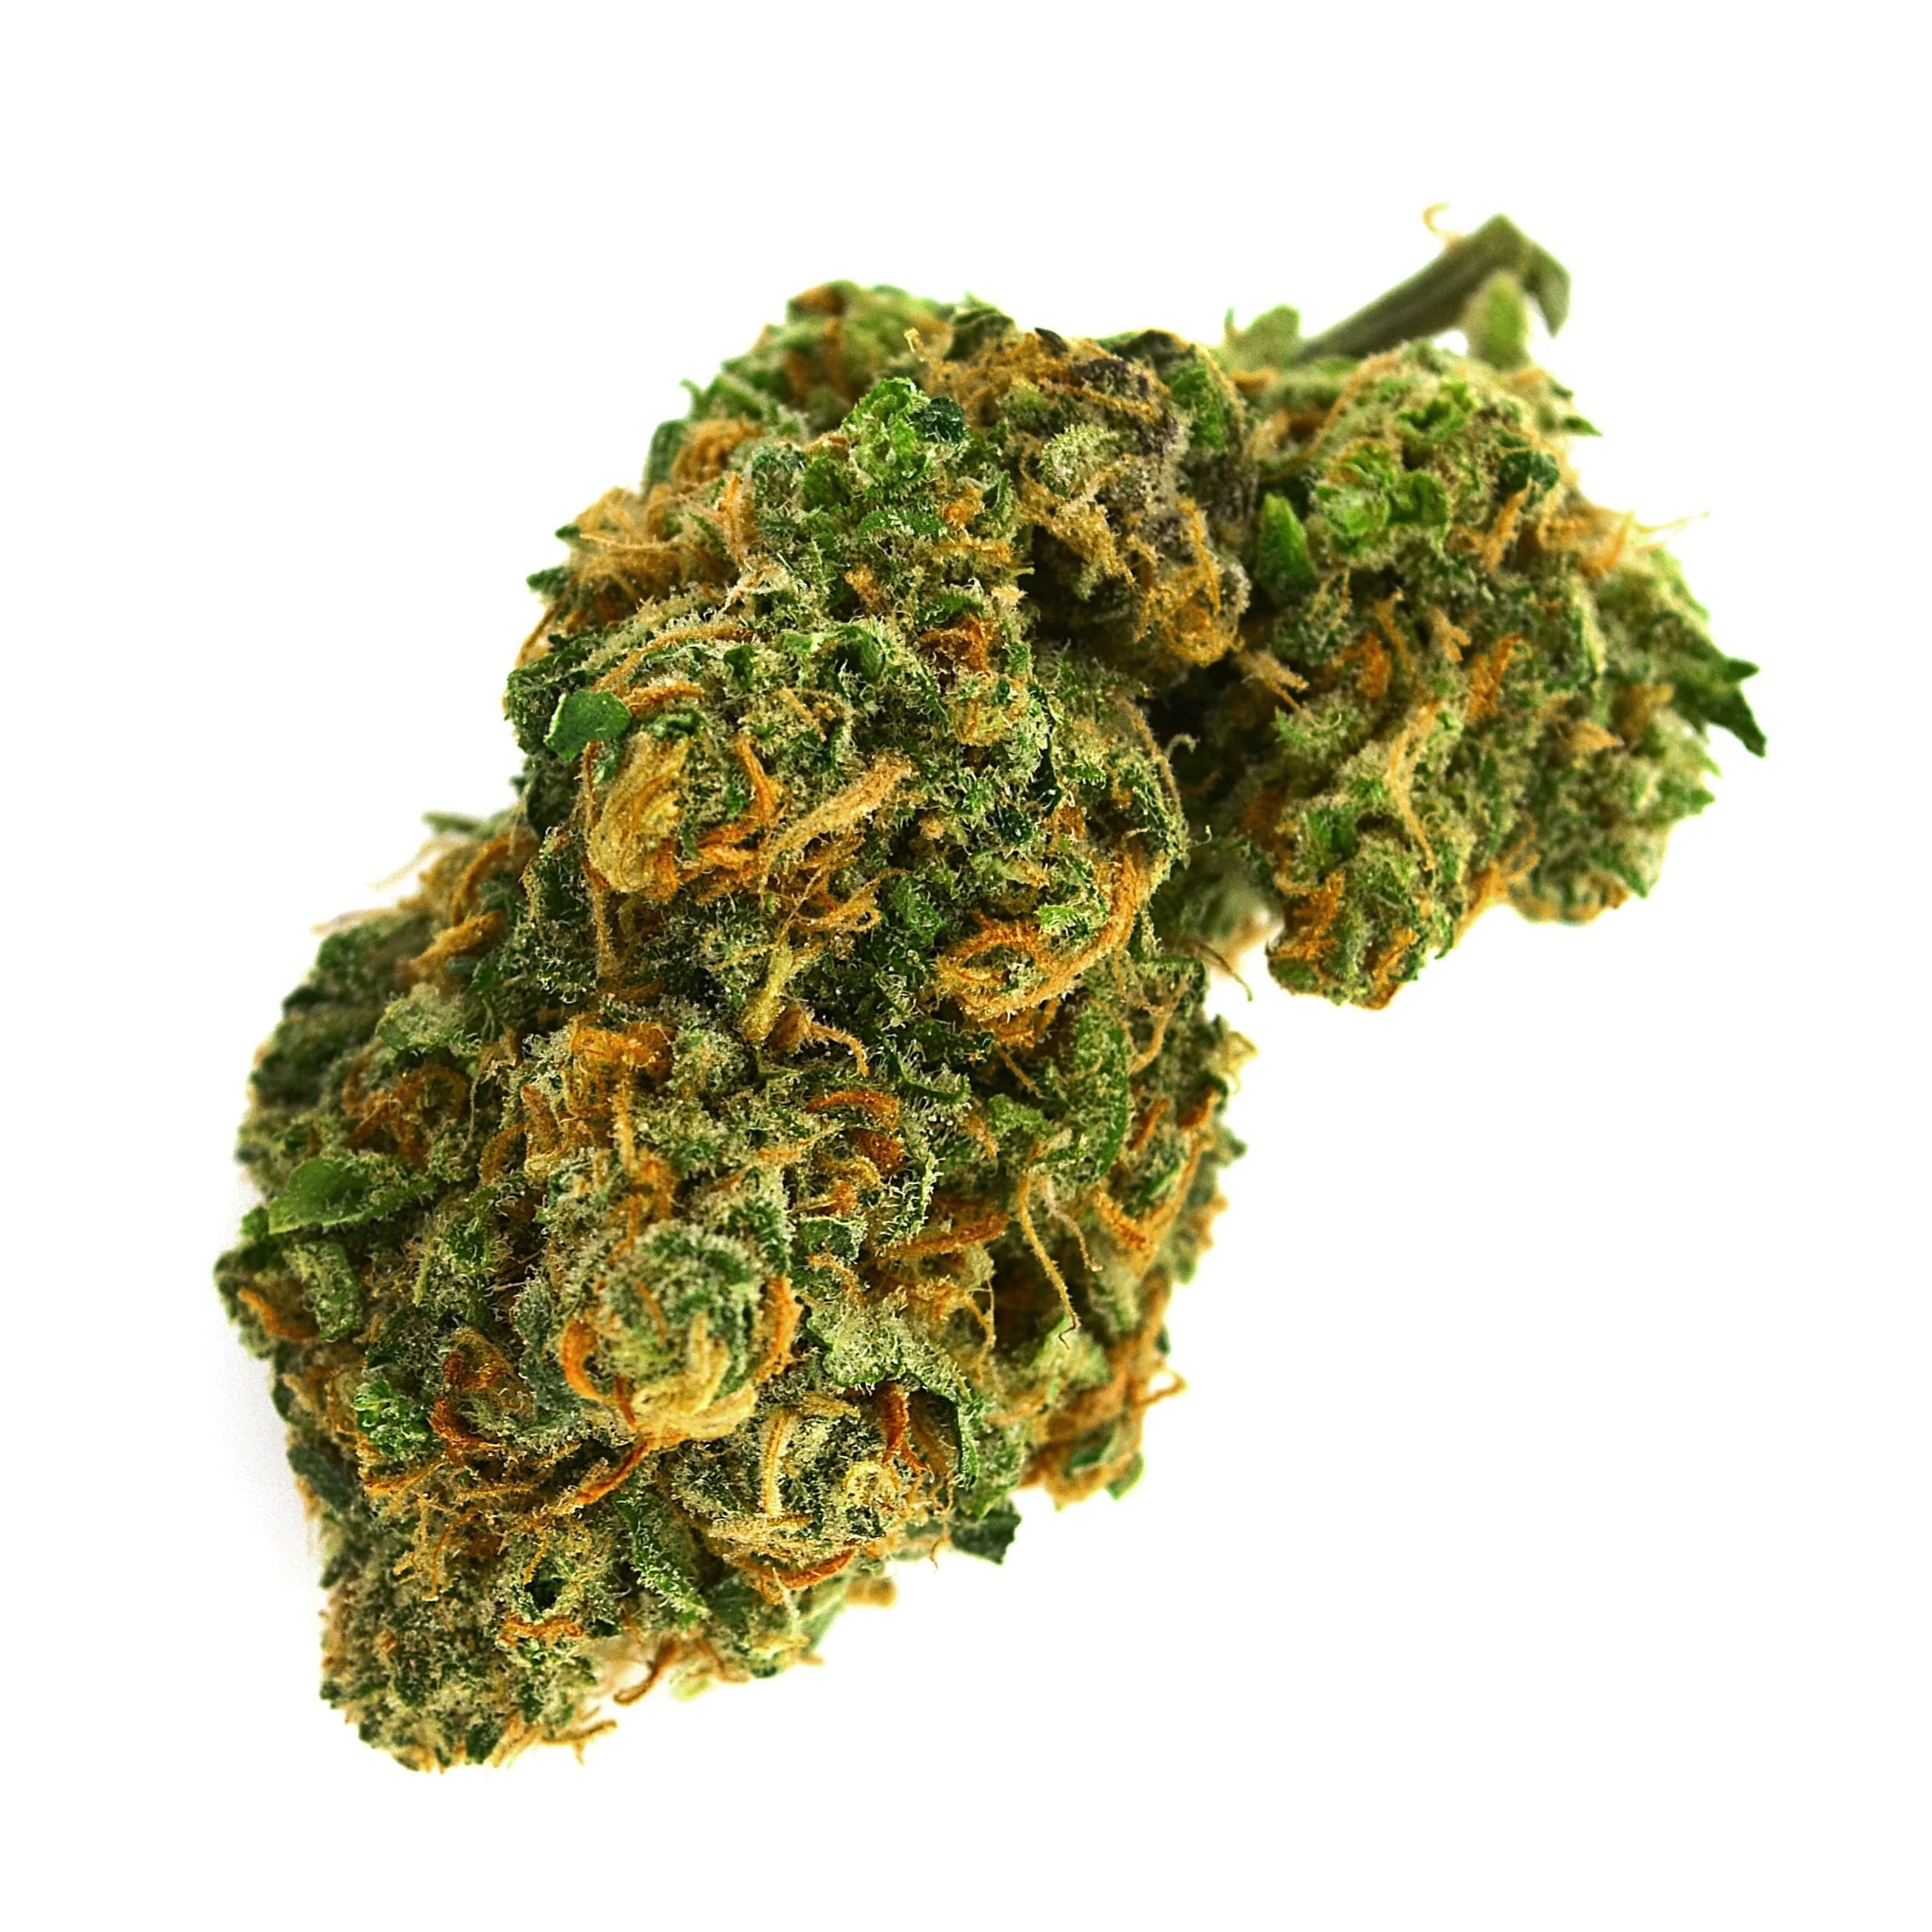 Herb Los Angeles Marijuana Delivery